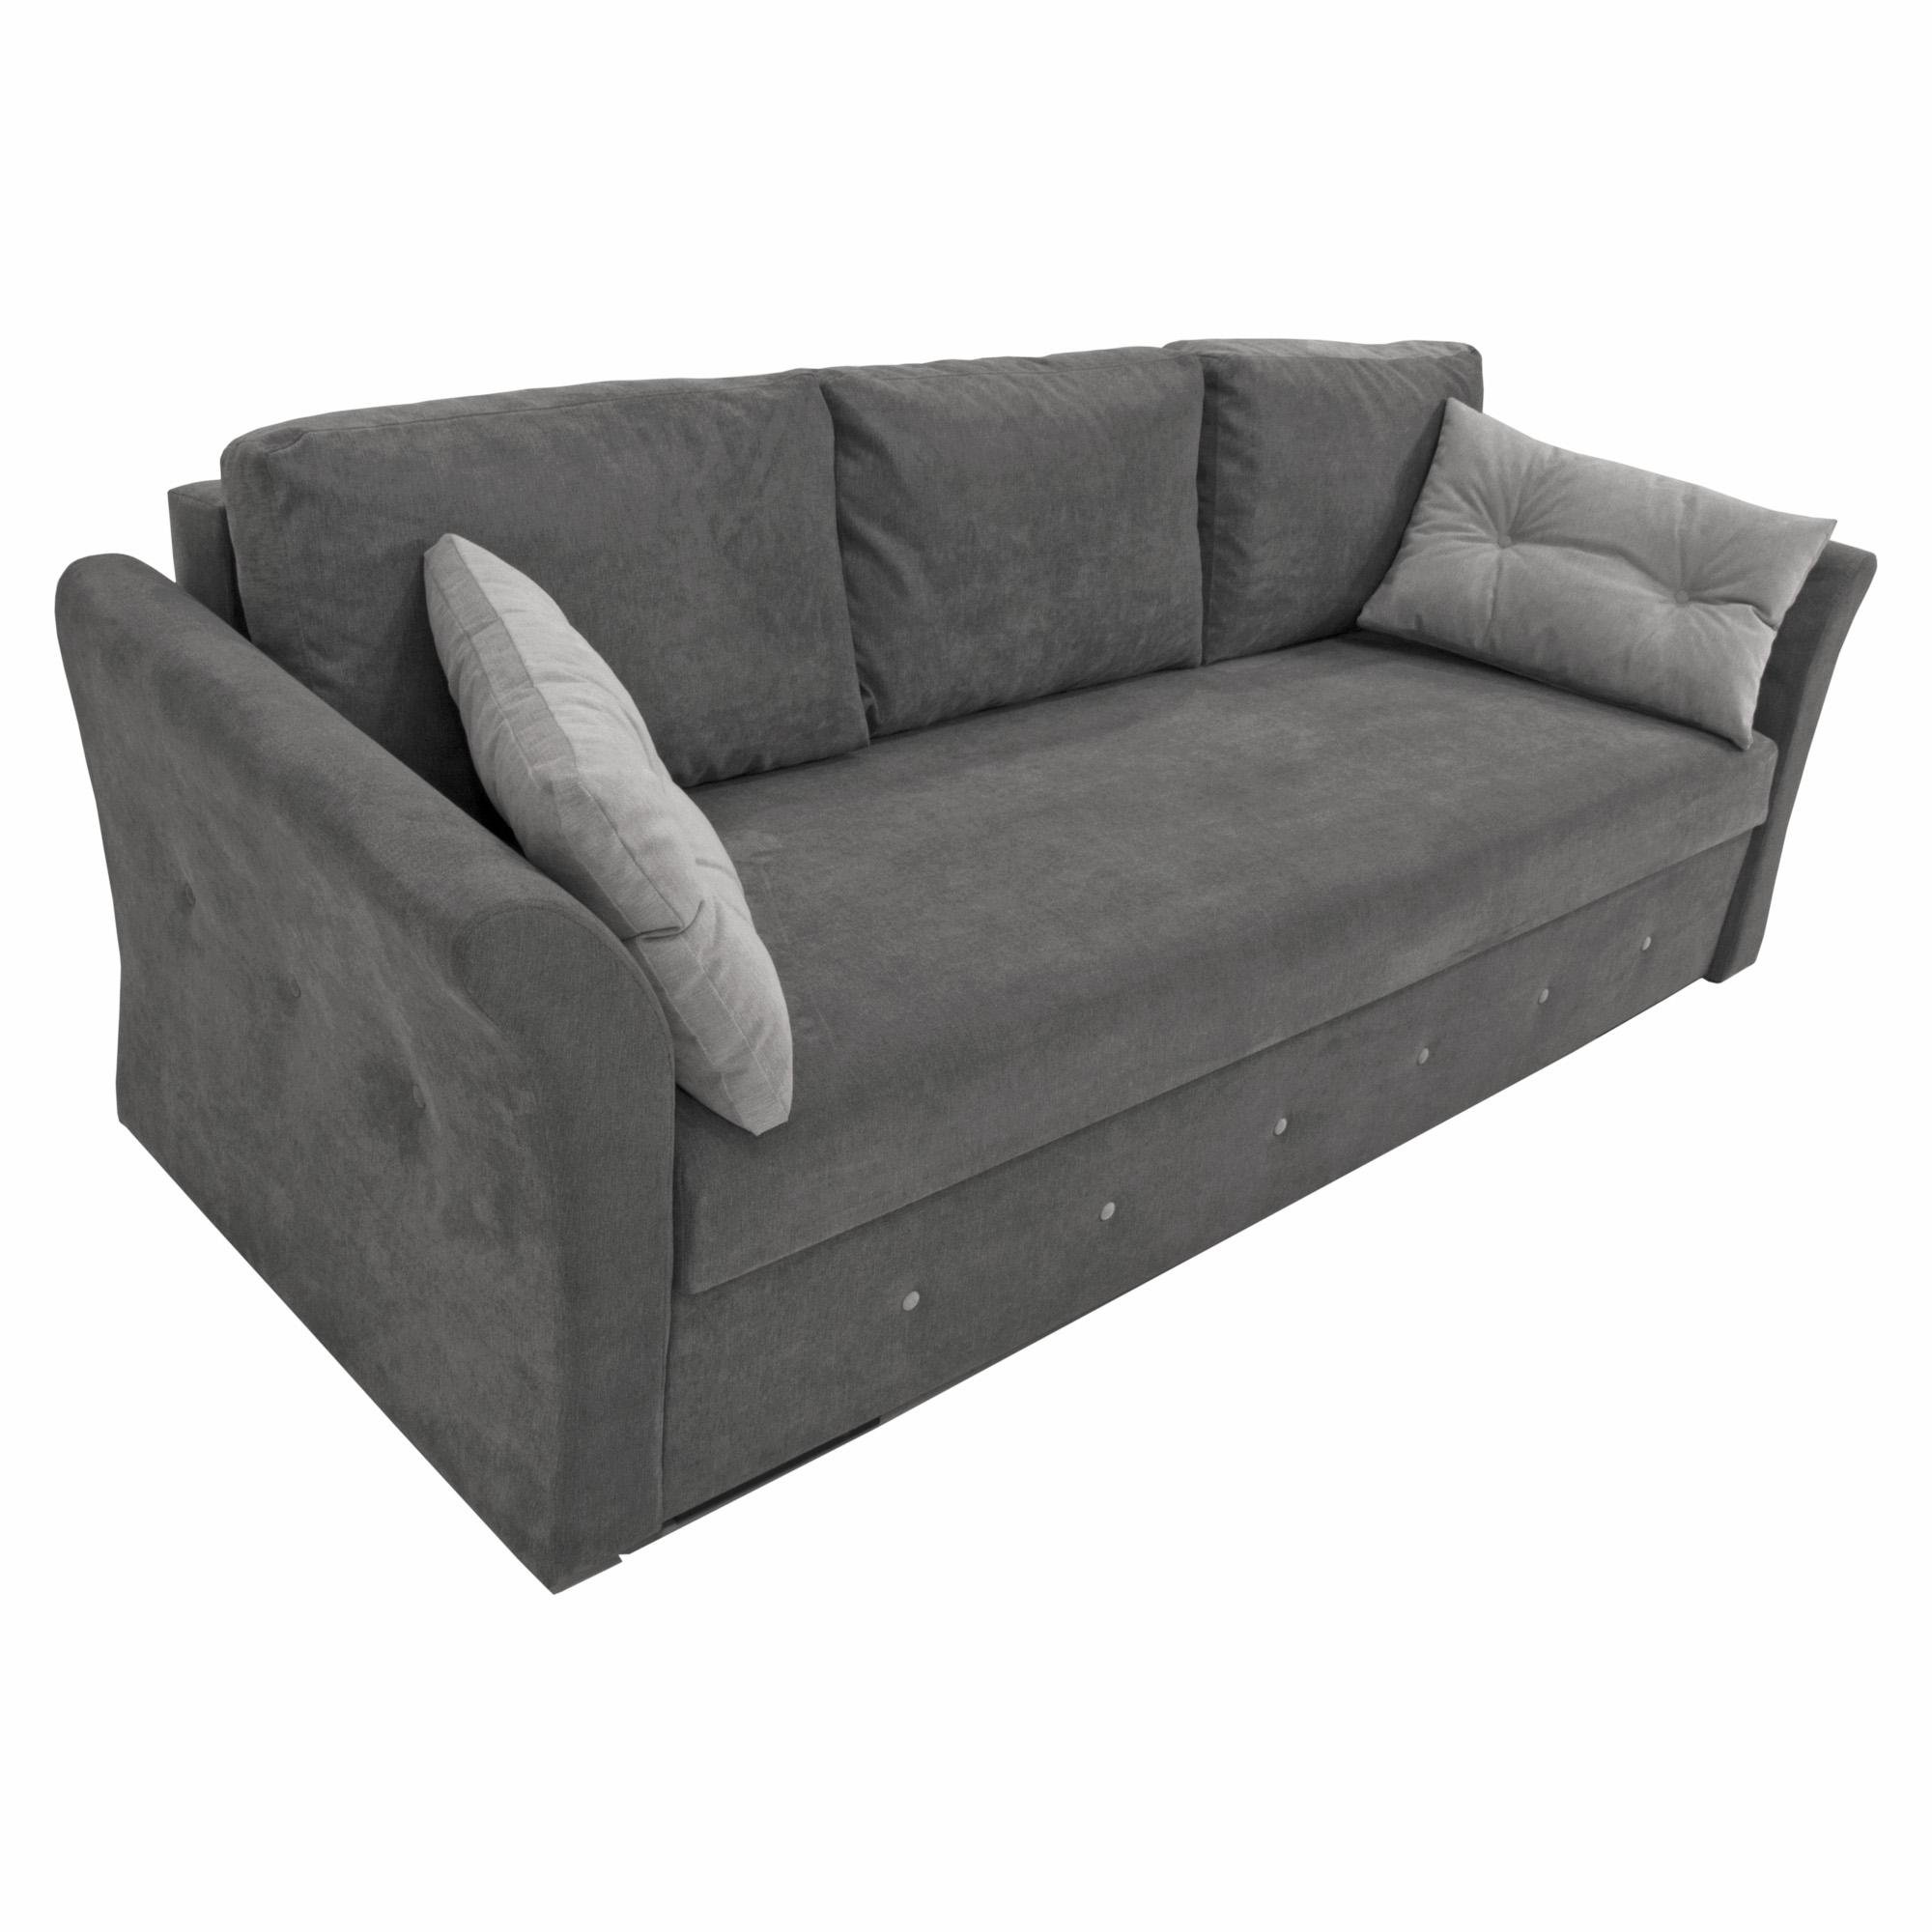 Sofa-Lova Lily Pilka